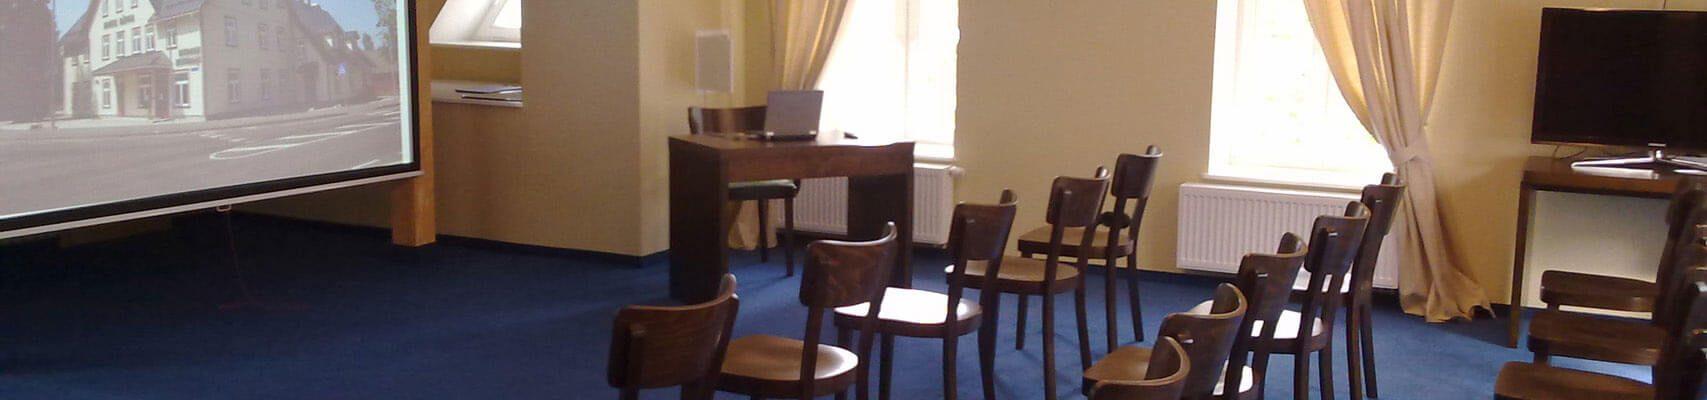 Seminariruumi rent |Hotell Räpina